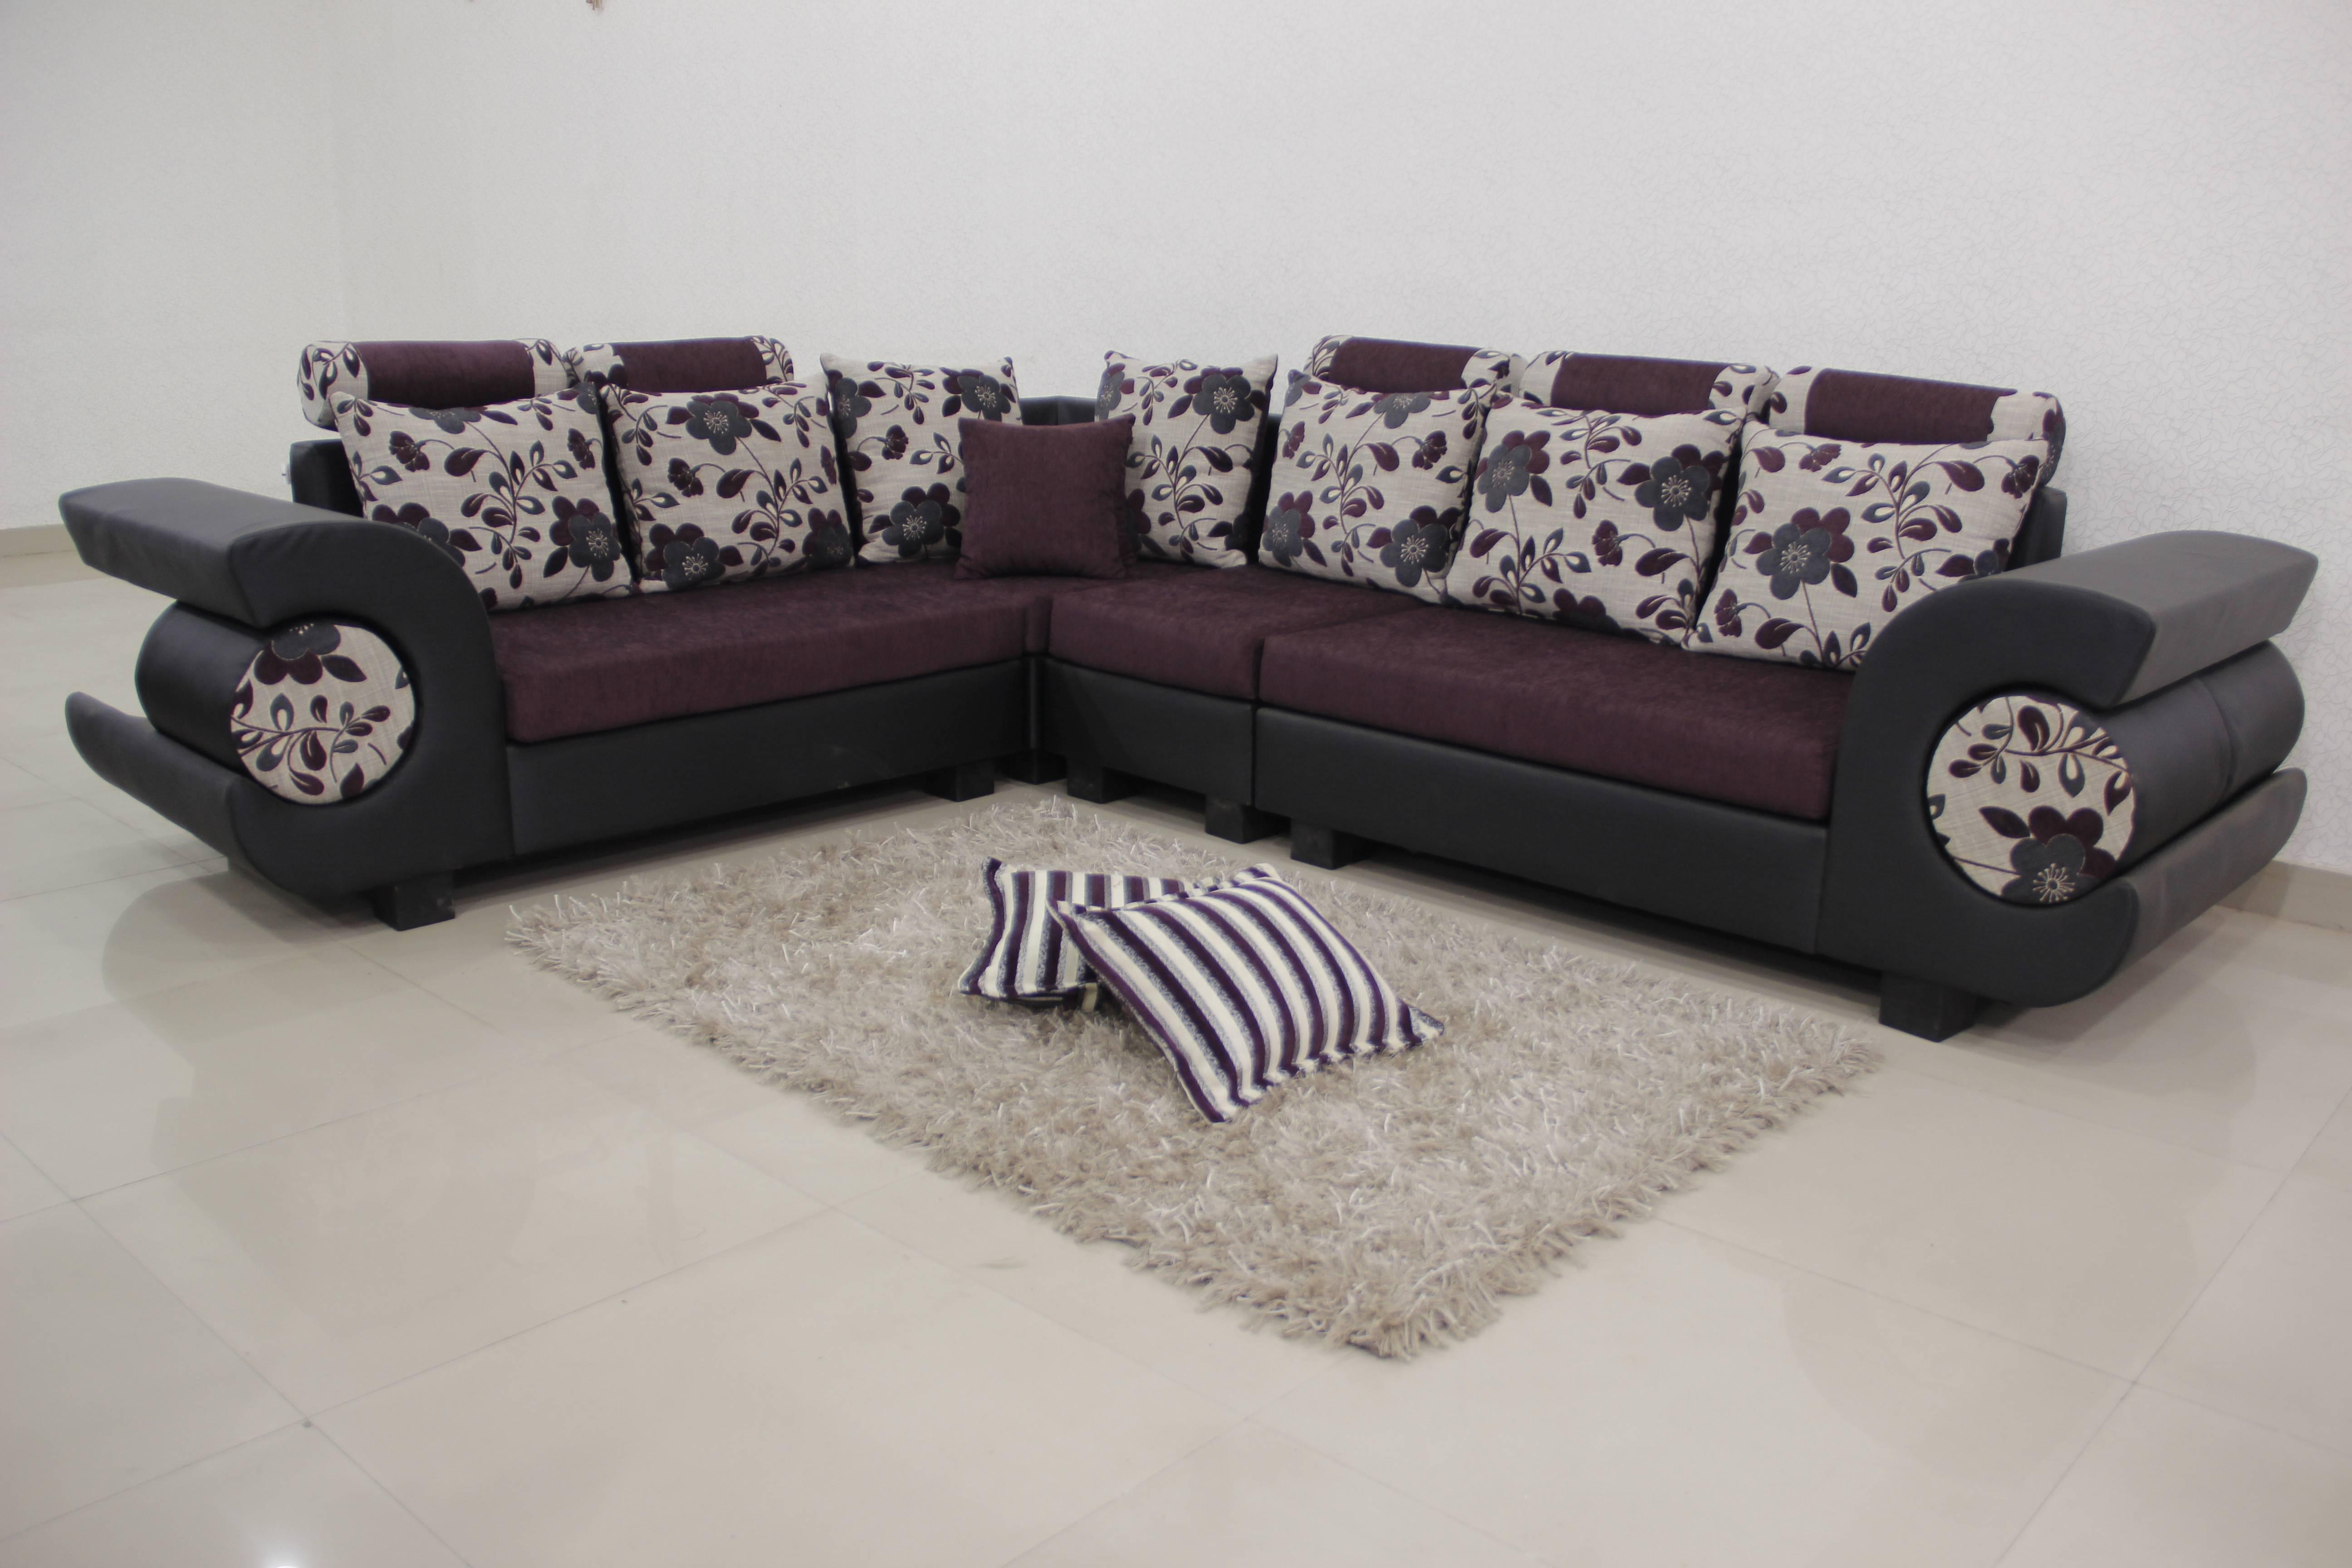 Comfortable Sofa | Ihome Furniture regarding Sofa Corner Units (Image 5 of 30)